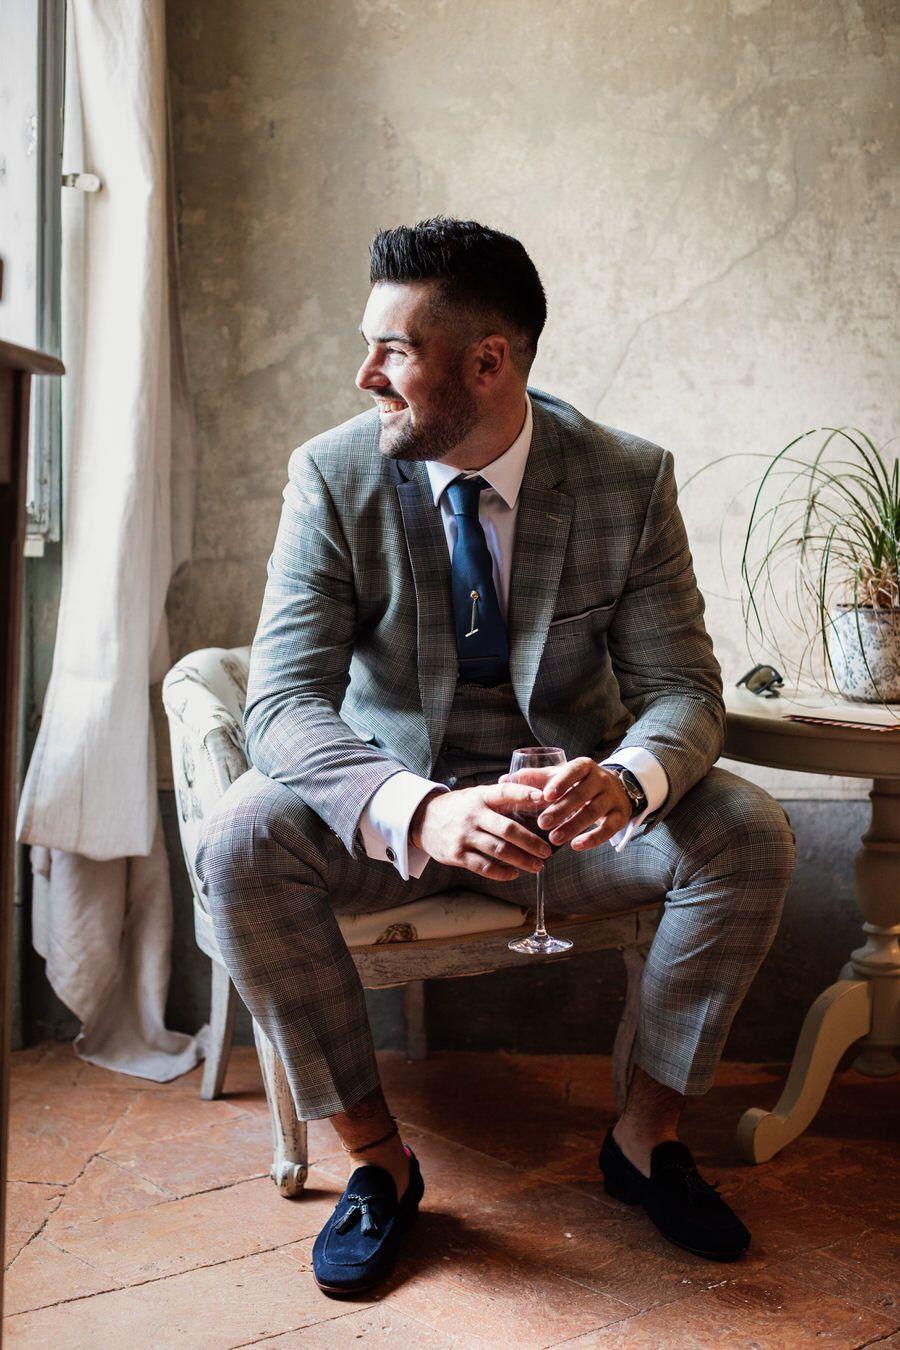 Pan Mlody Inspiracje Slub We Wloszech Nad Jeziorem Como Style Wedding Time Rustic Chic